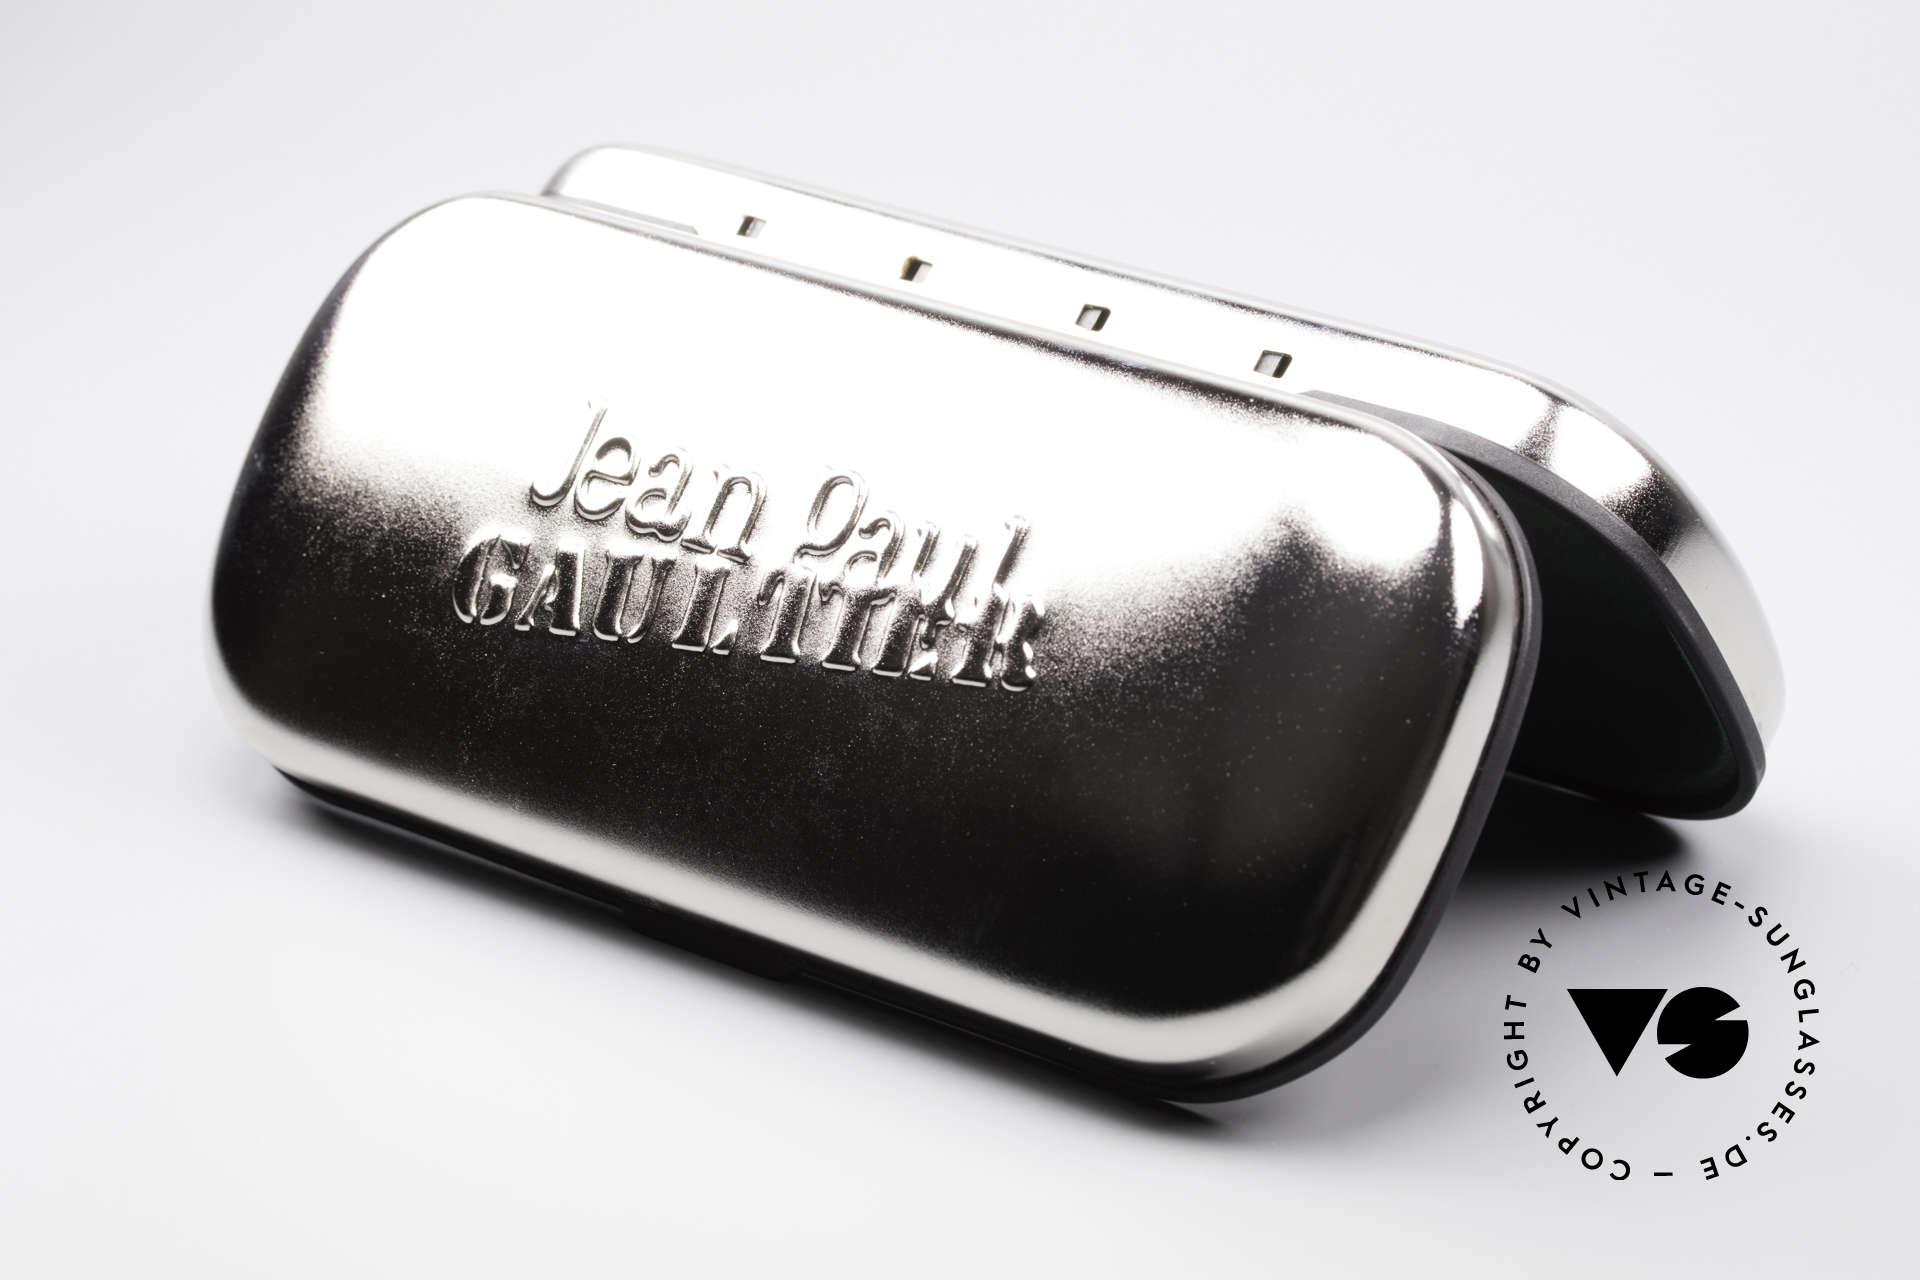 Jean Paul Gaultier 58-1271 Junior Gaultier Sunglasses, Size: medium, Made for Men and Women